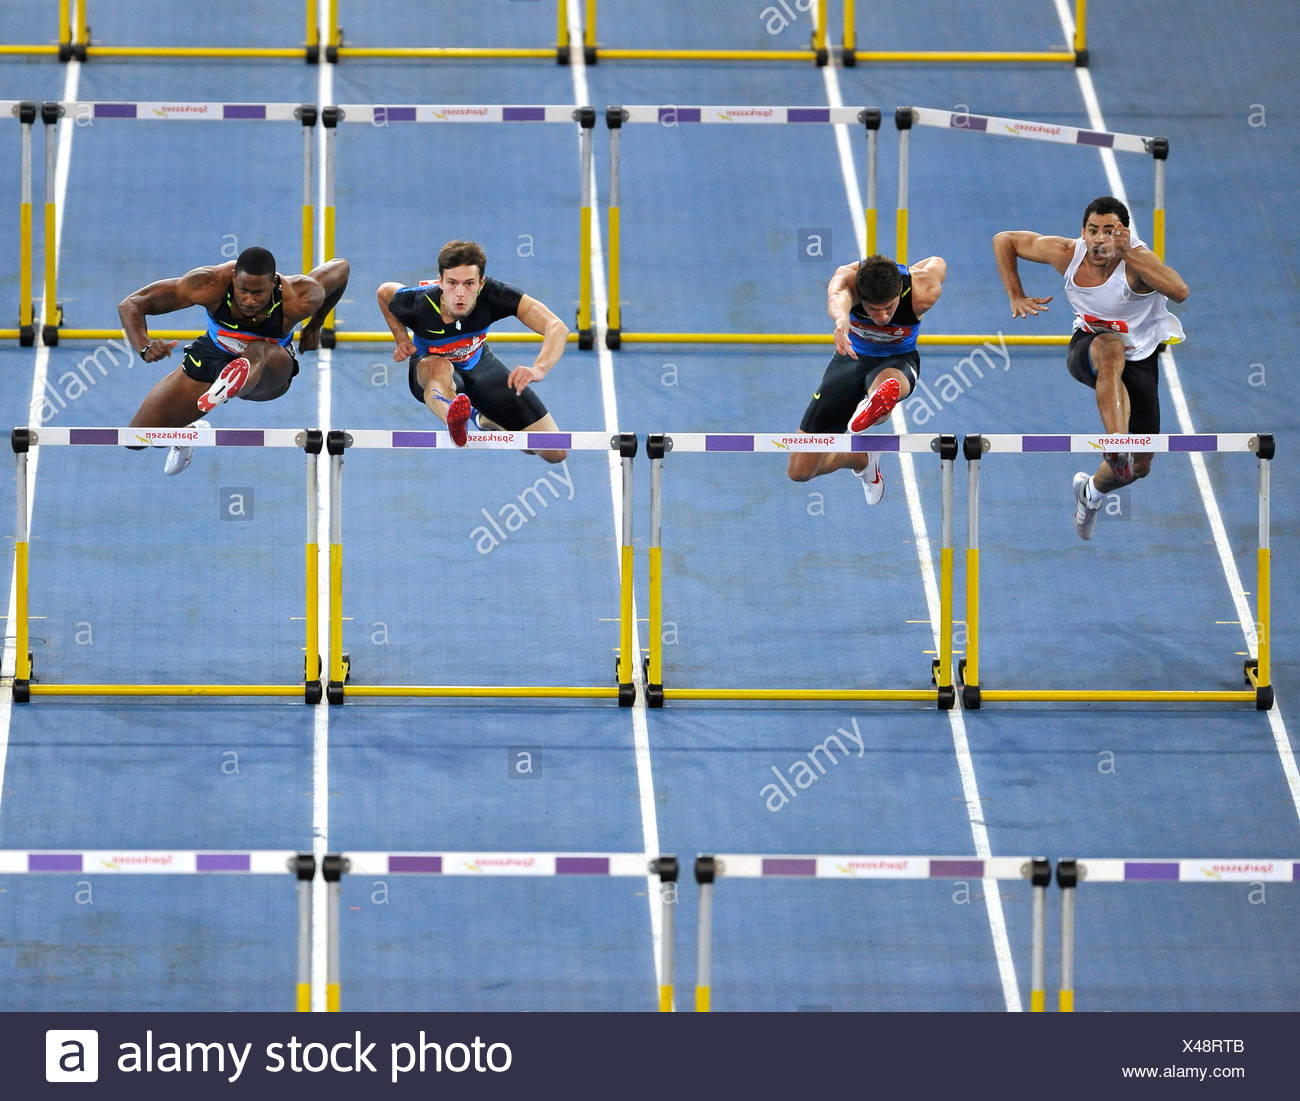 60 m ostacoli, uomini, da sinistra: Darien Garfield FRA, Erik Balnuweit GER, Evgeniy Borisov RUS, David Oiver USA, Sparkassen-Cup 200 Immagini Stock